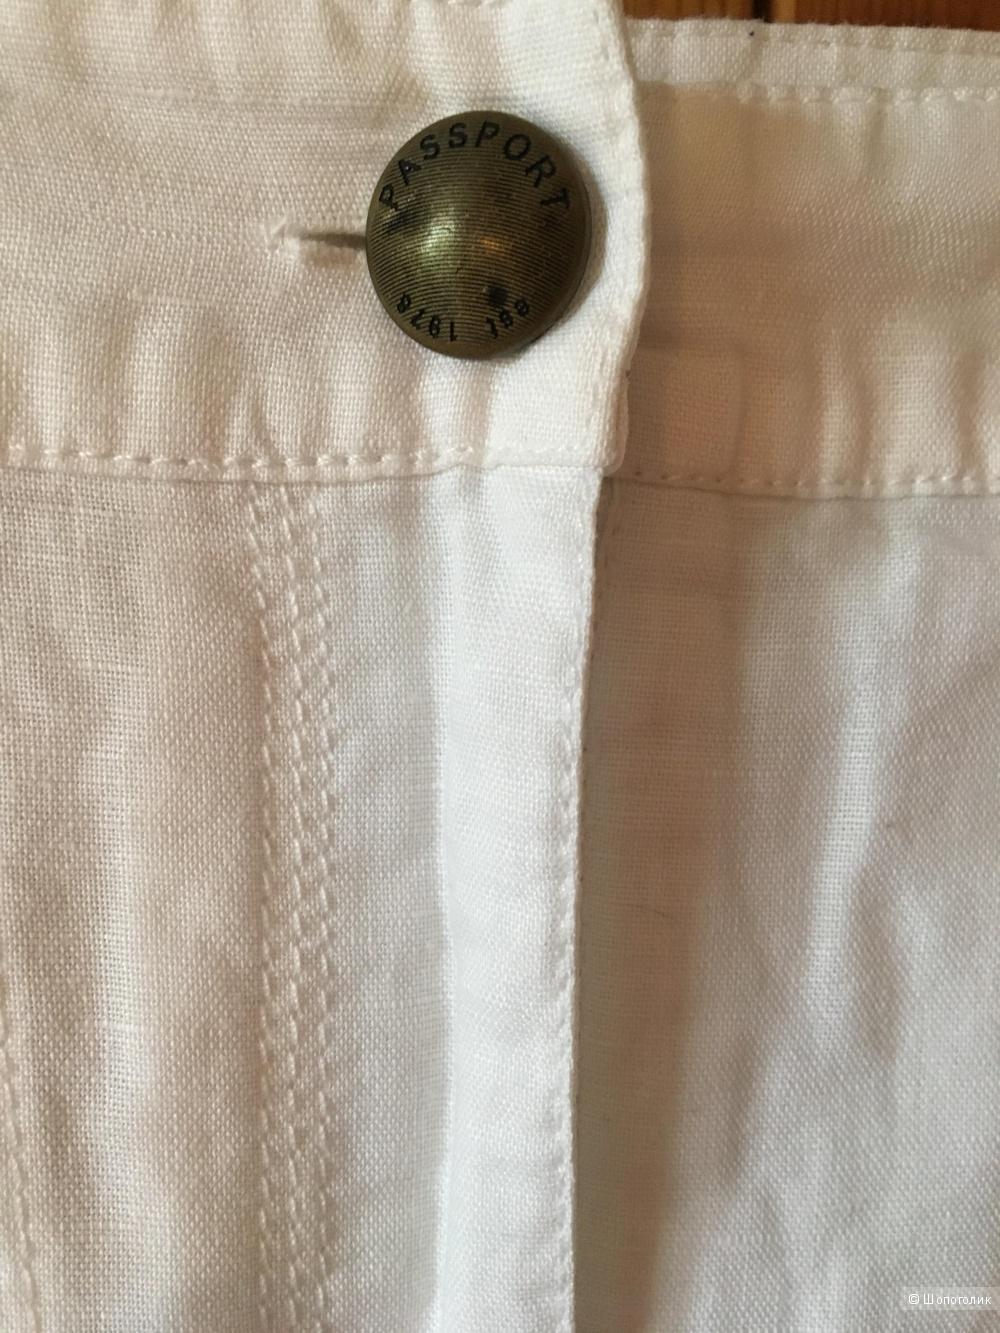 Белая юбка-карандаш лен/хлопок PASSPORT размер немецкий 38 (на 46)